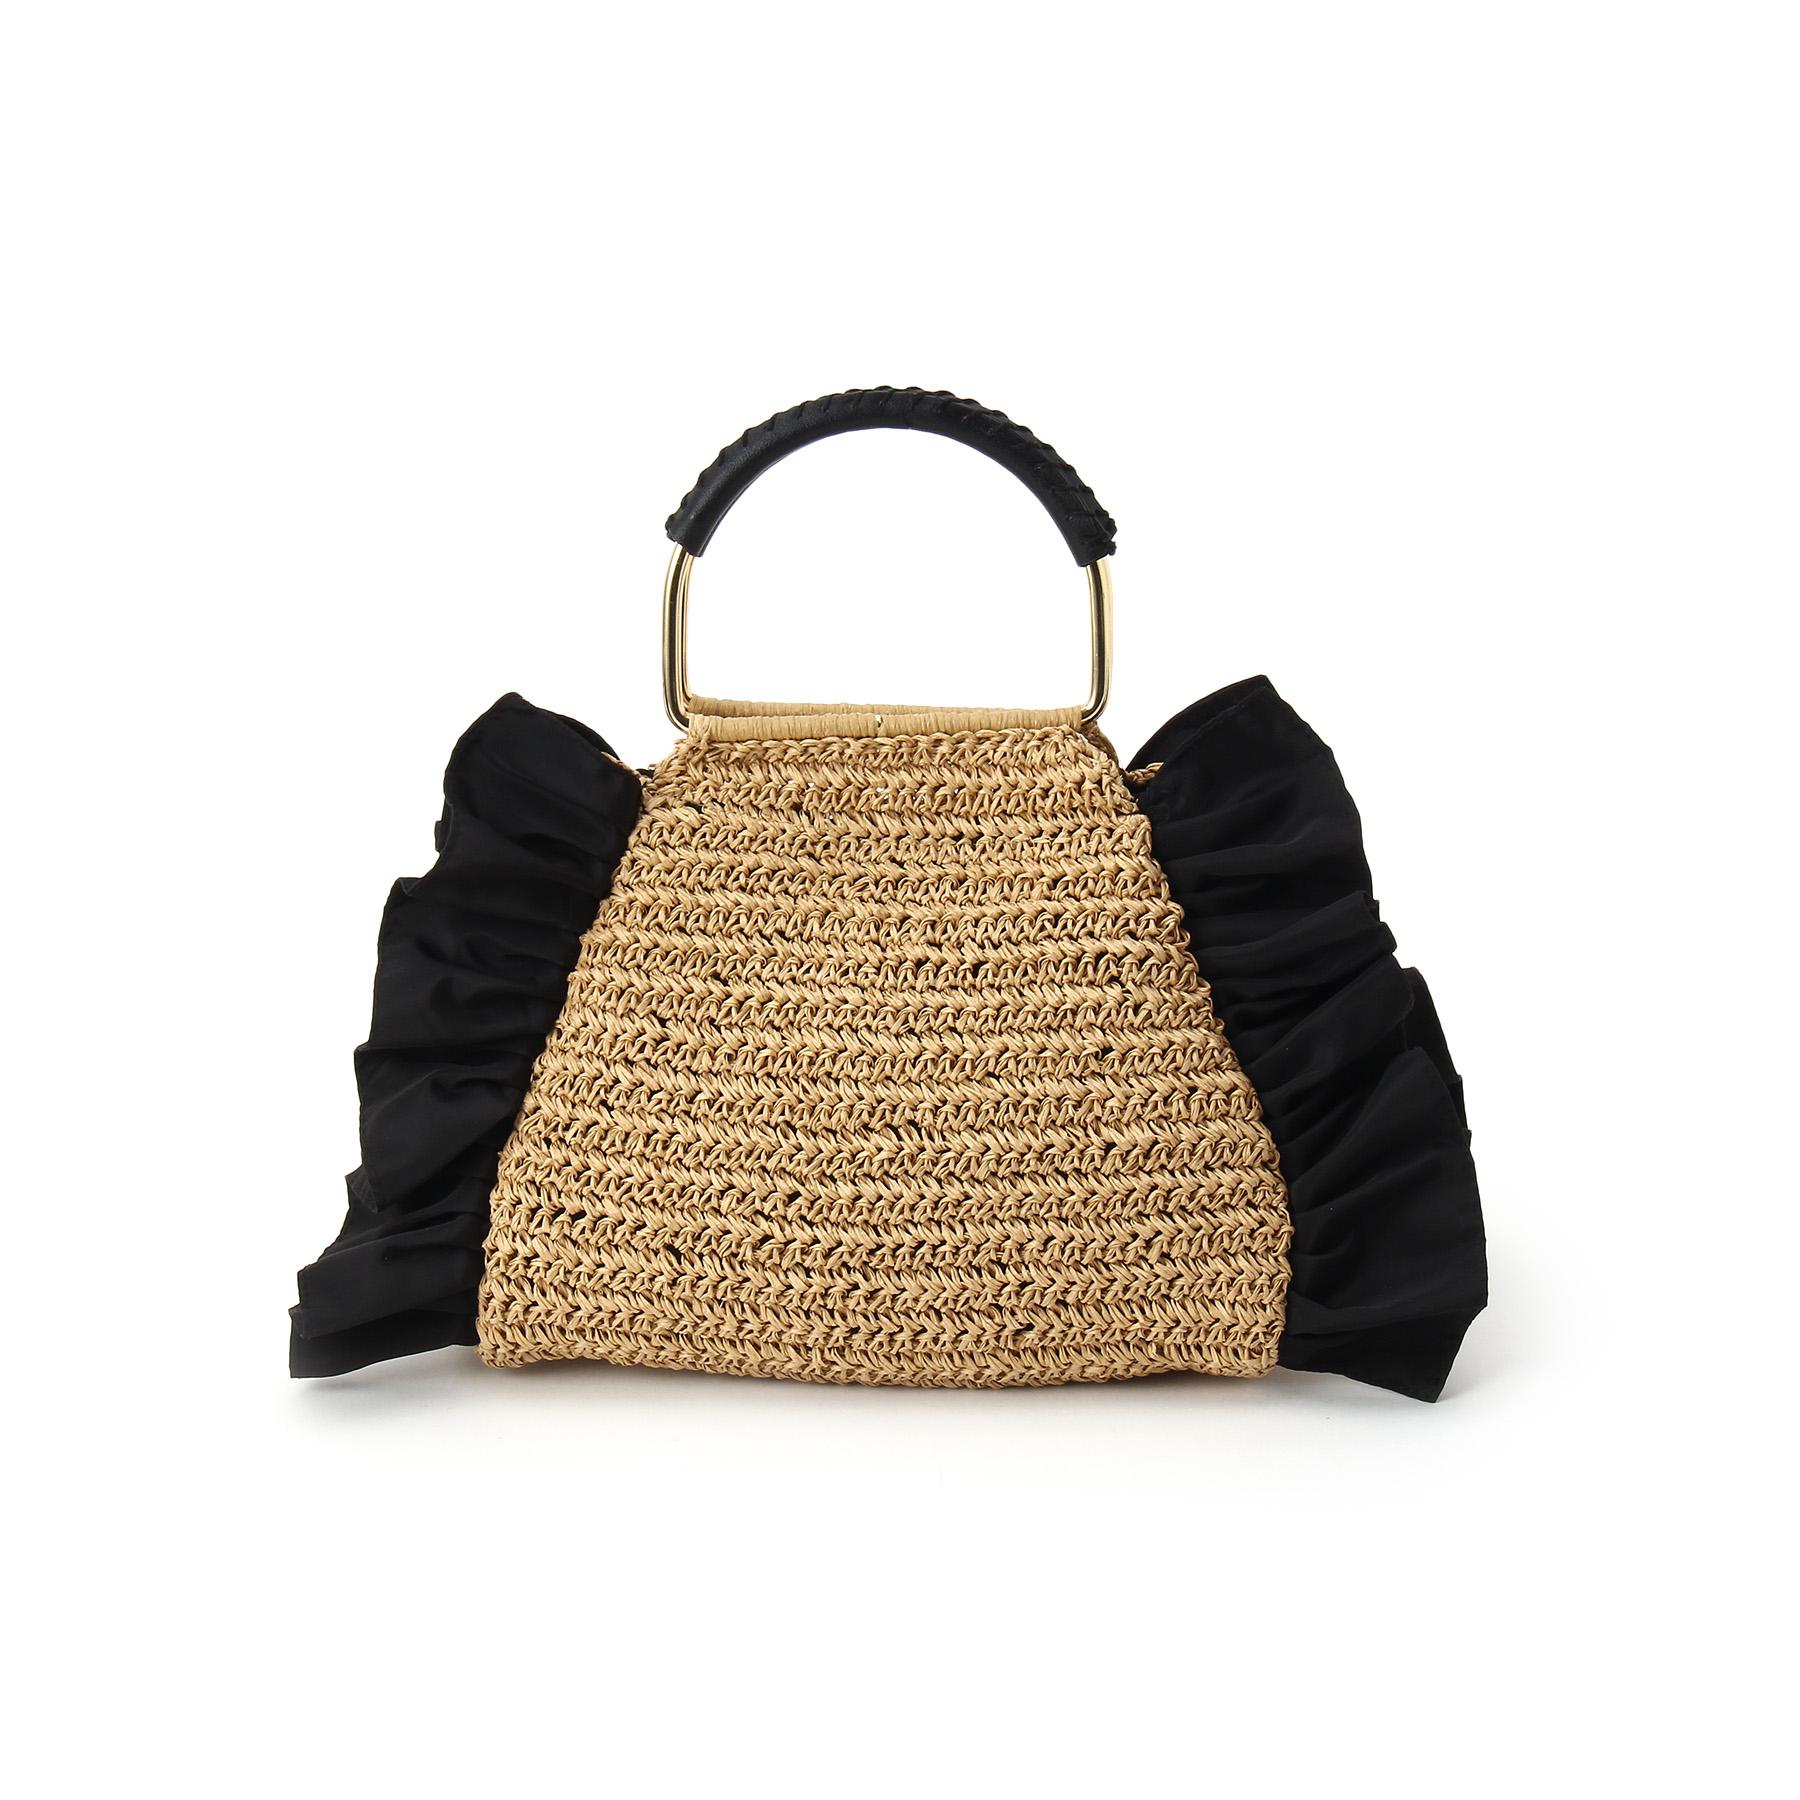 【Couture brooch (クチュールブローチ)】【WEB限定販売】サイドフリルカゴバッグレディース バッグ|ハンドバッグ ブラック